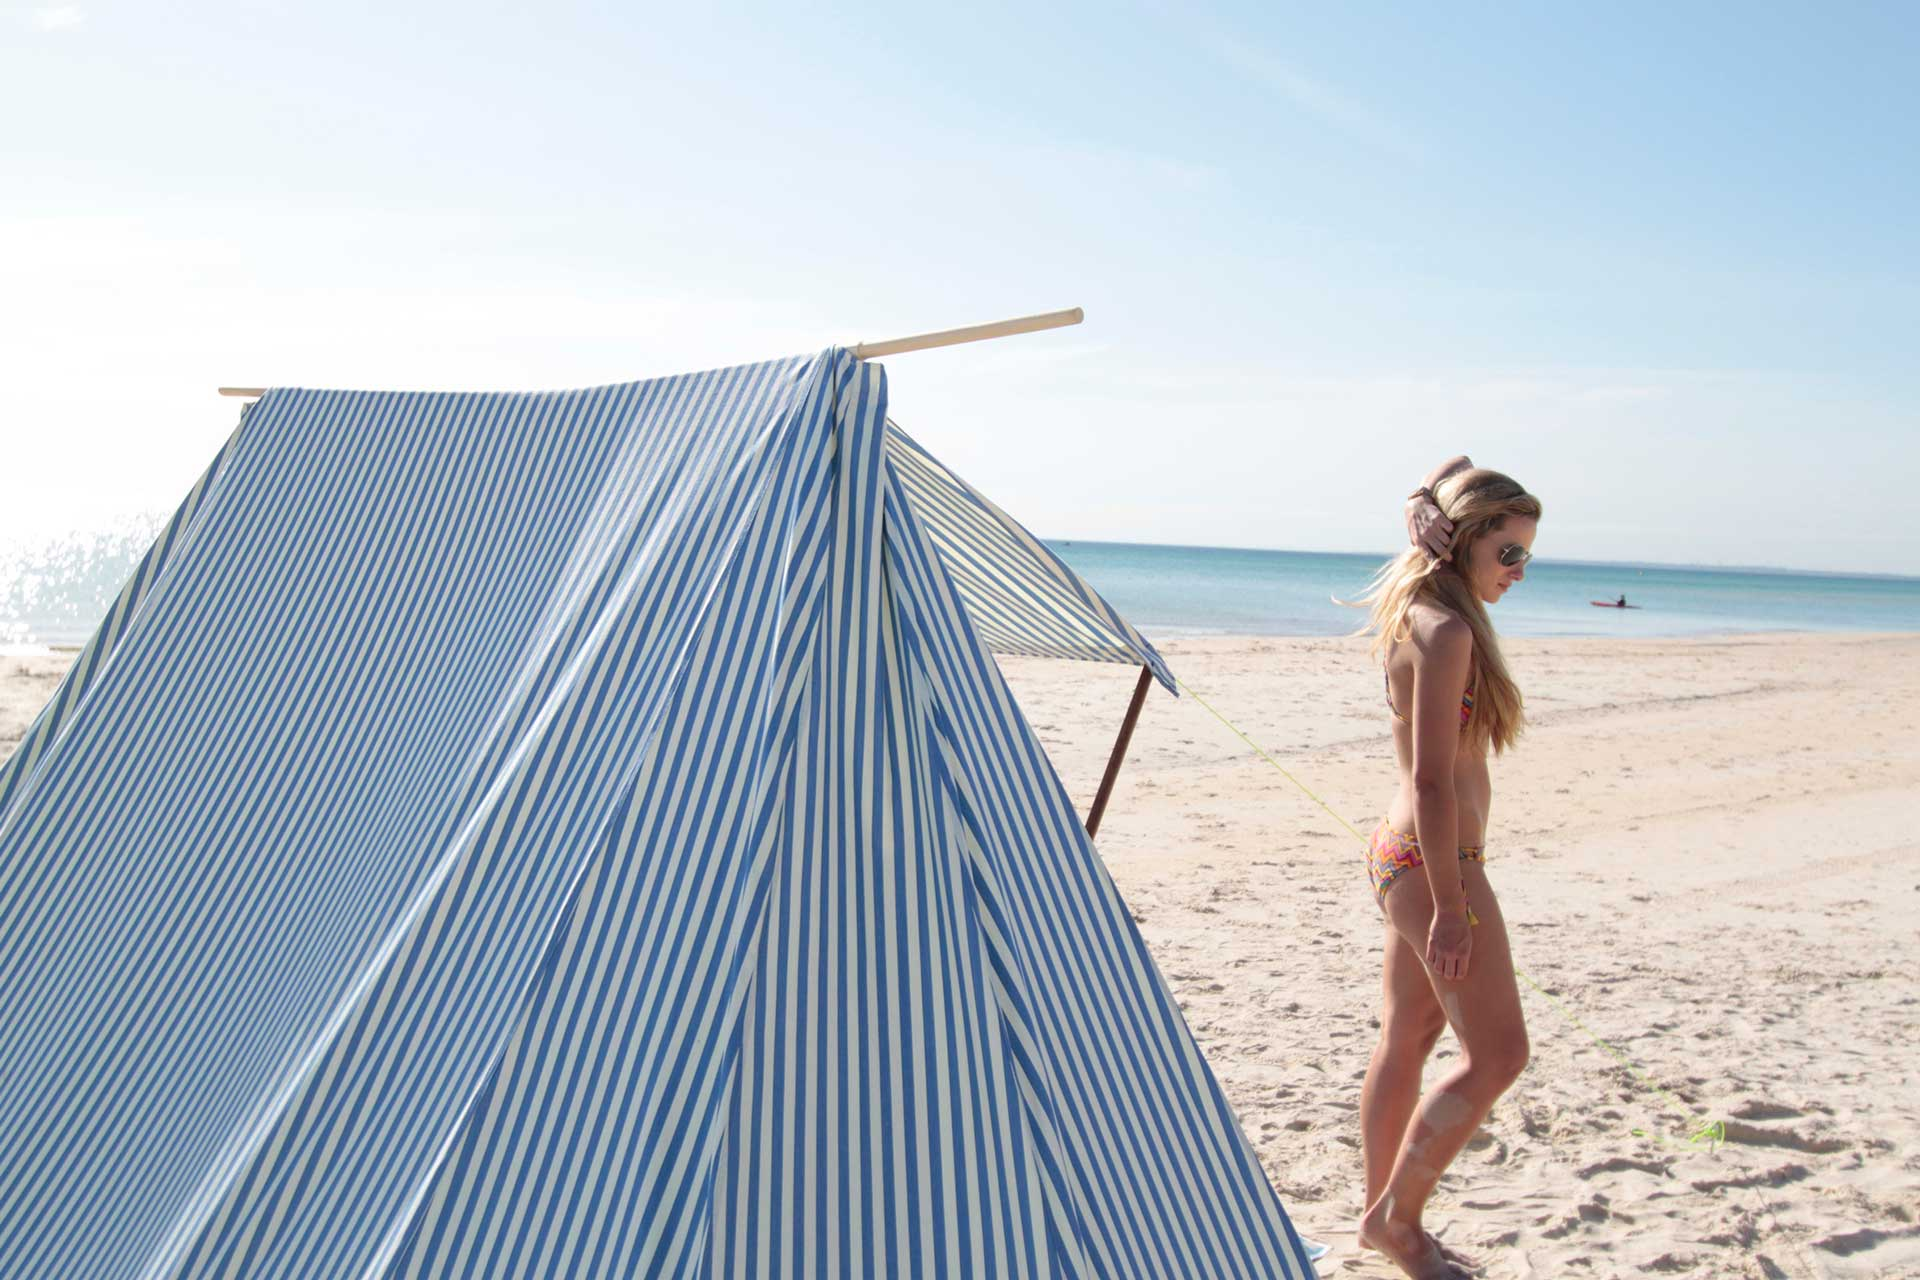 one-foot-island-blue-stripe-beach-sun-tent